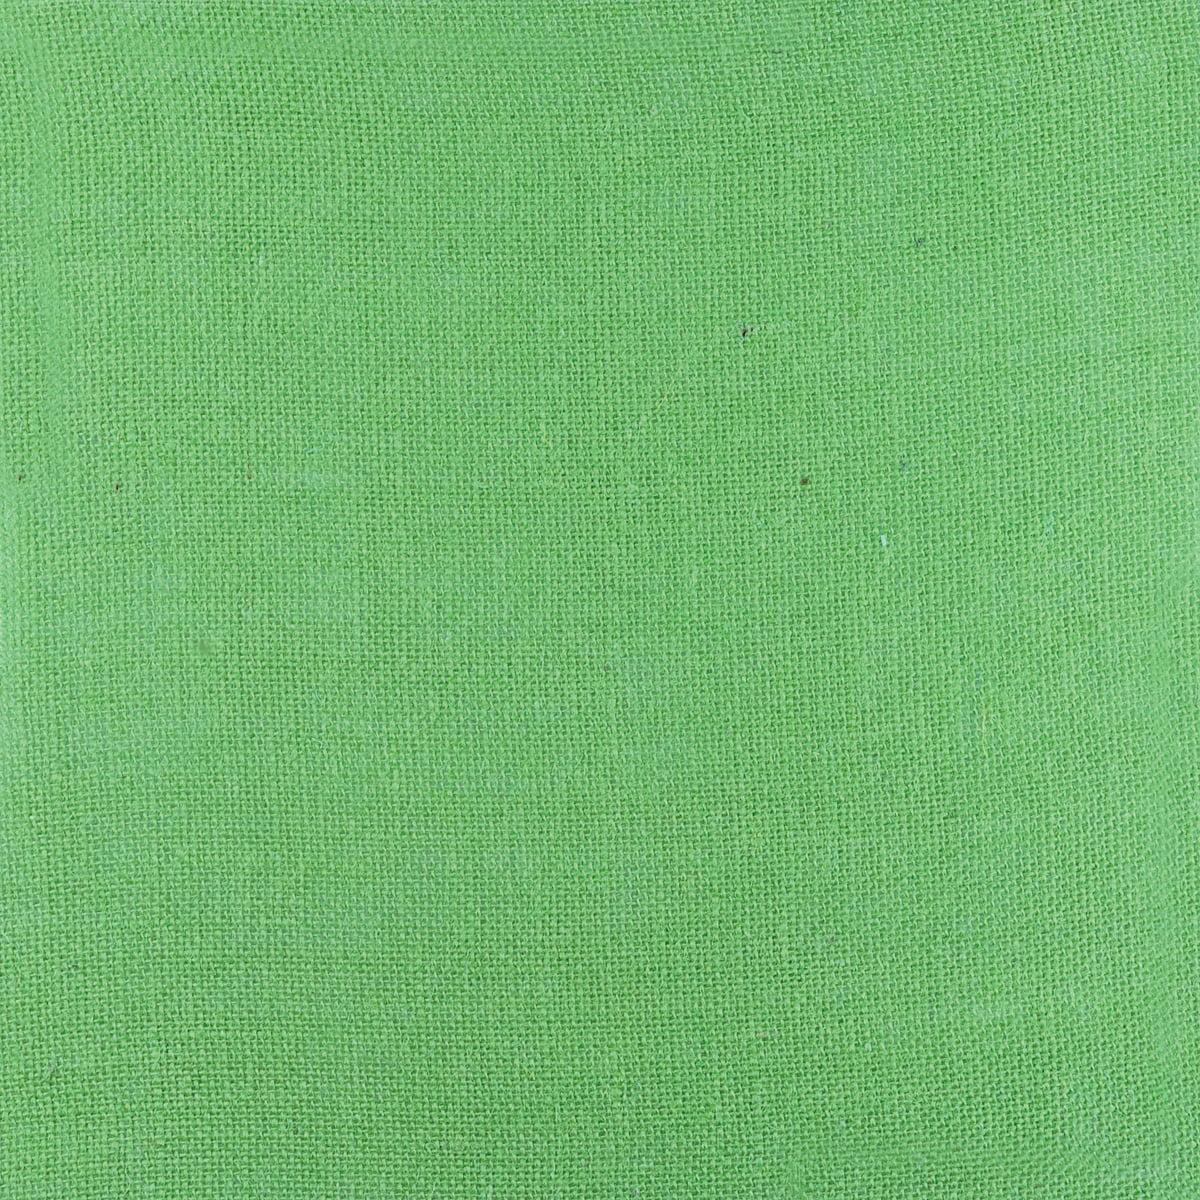 Burlap Sheet (unsewn) 100% Jute 12`X12`-Green Multi-Colored